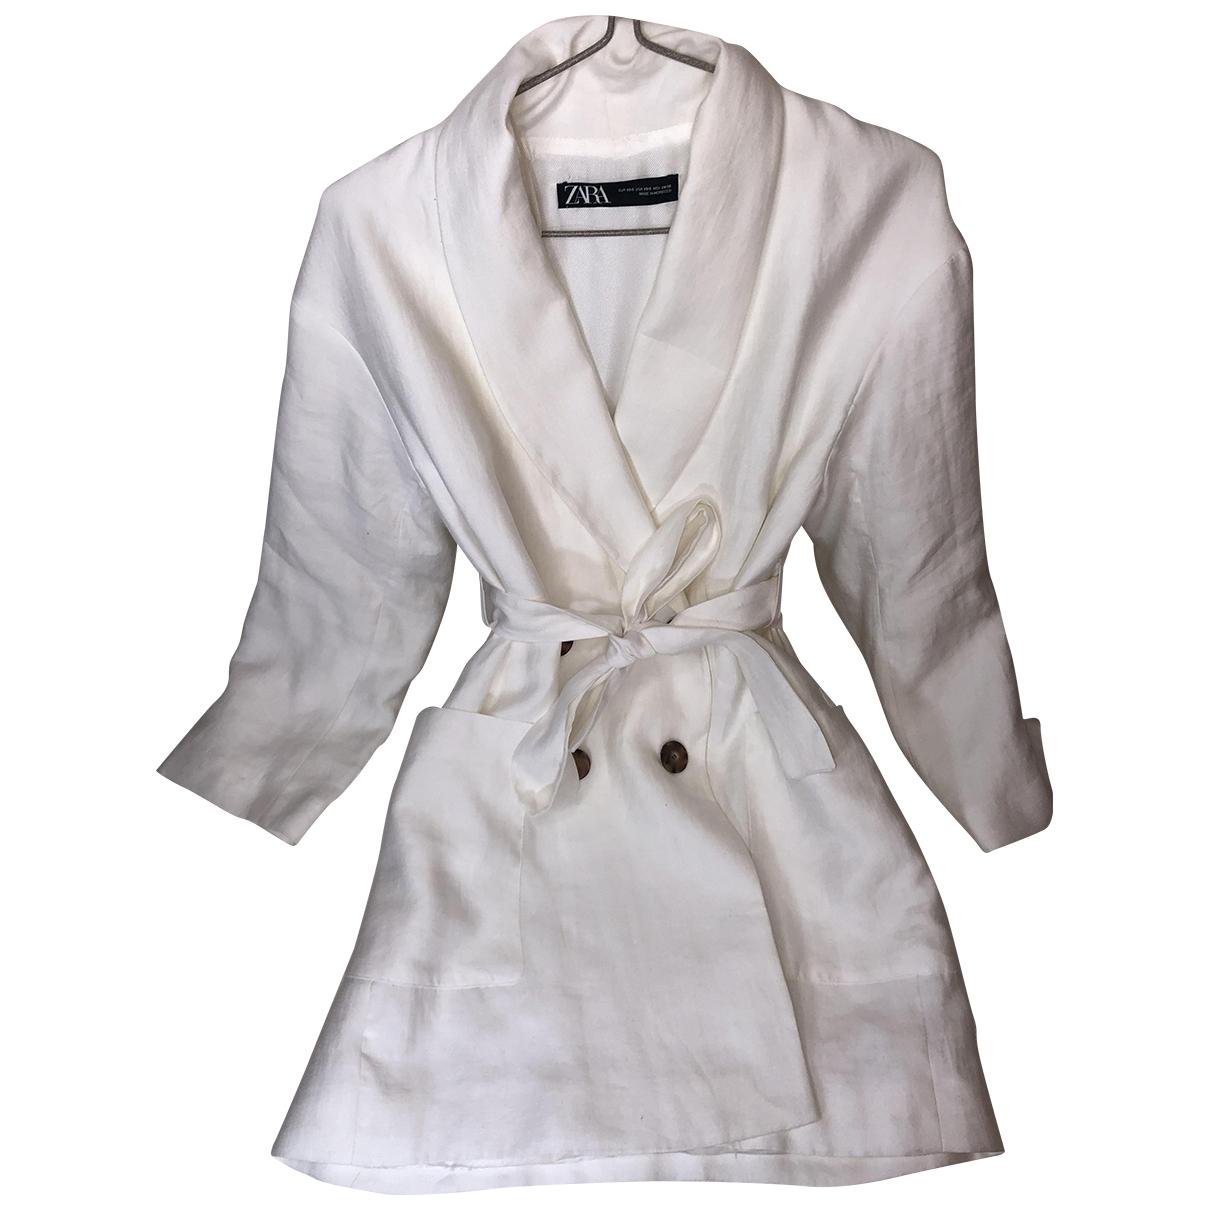 Zara - Manteau   pour femme en lin - blanc